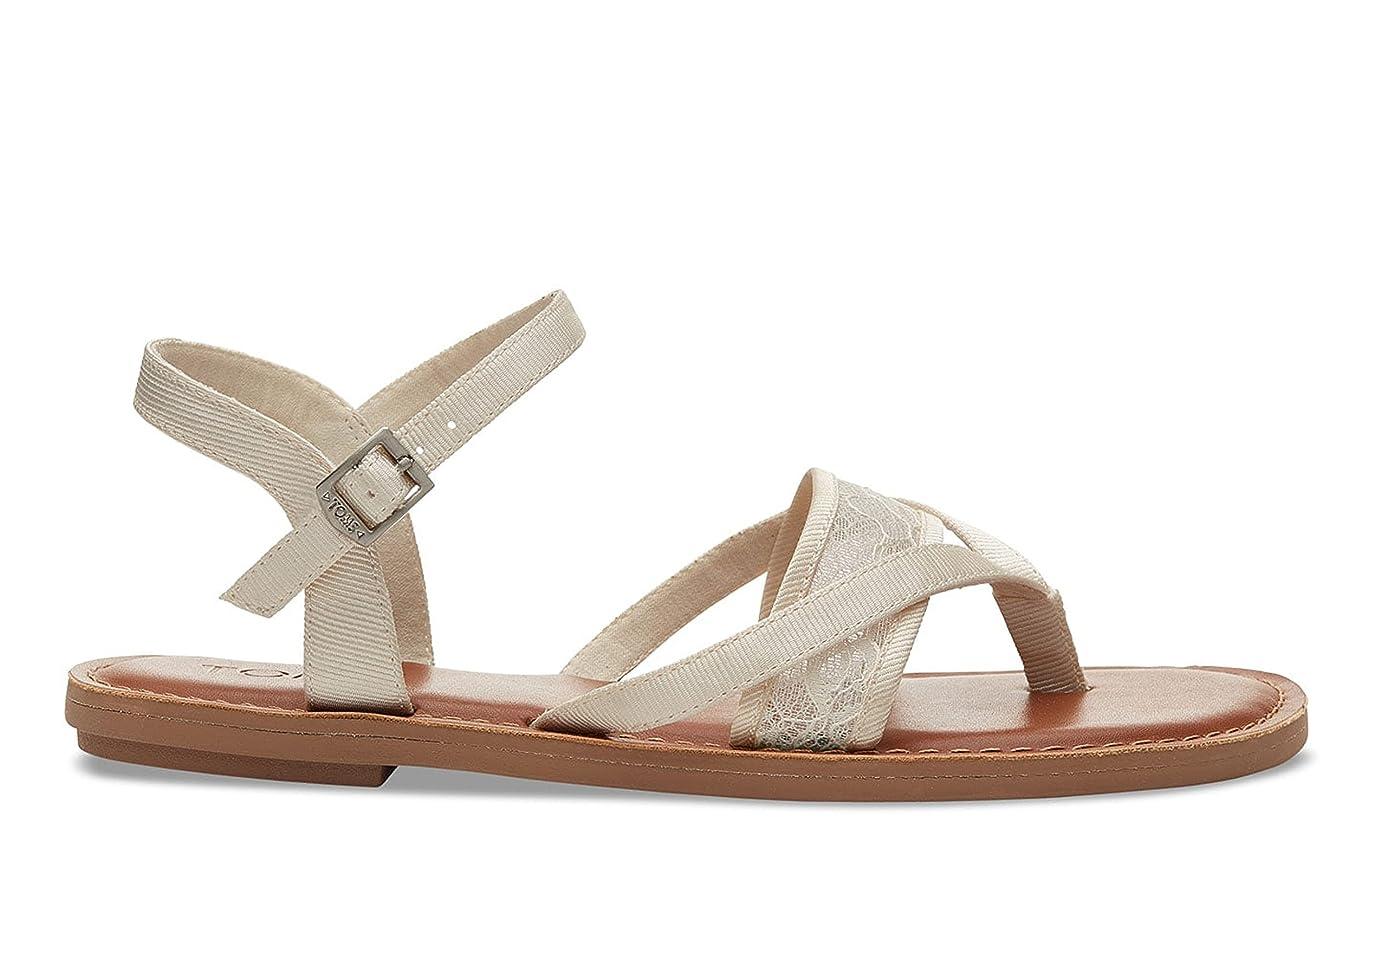 TOMS Womens Lexie Casual Sandals Shoes